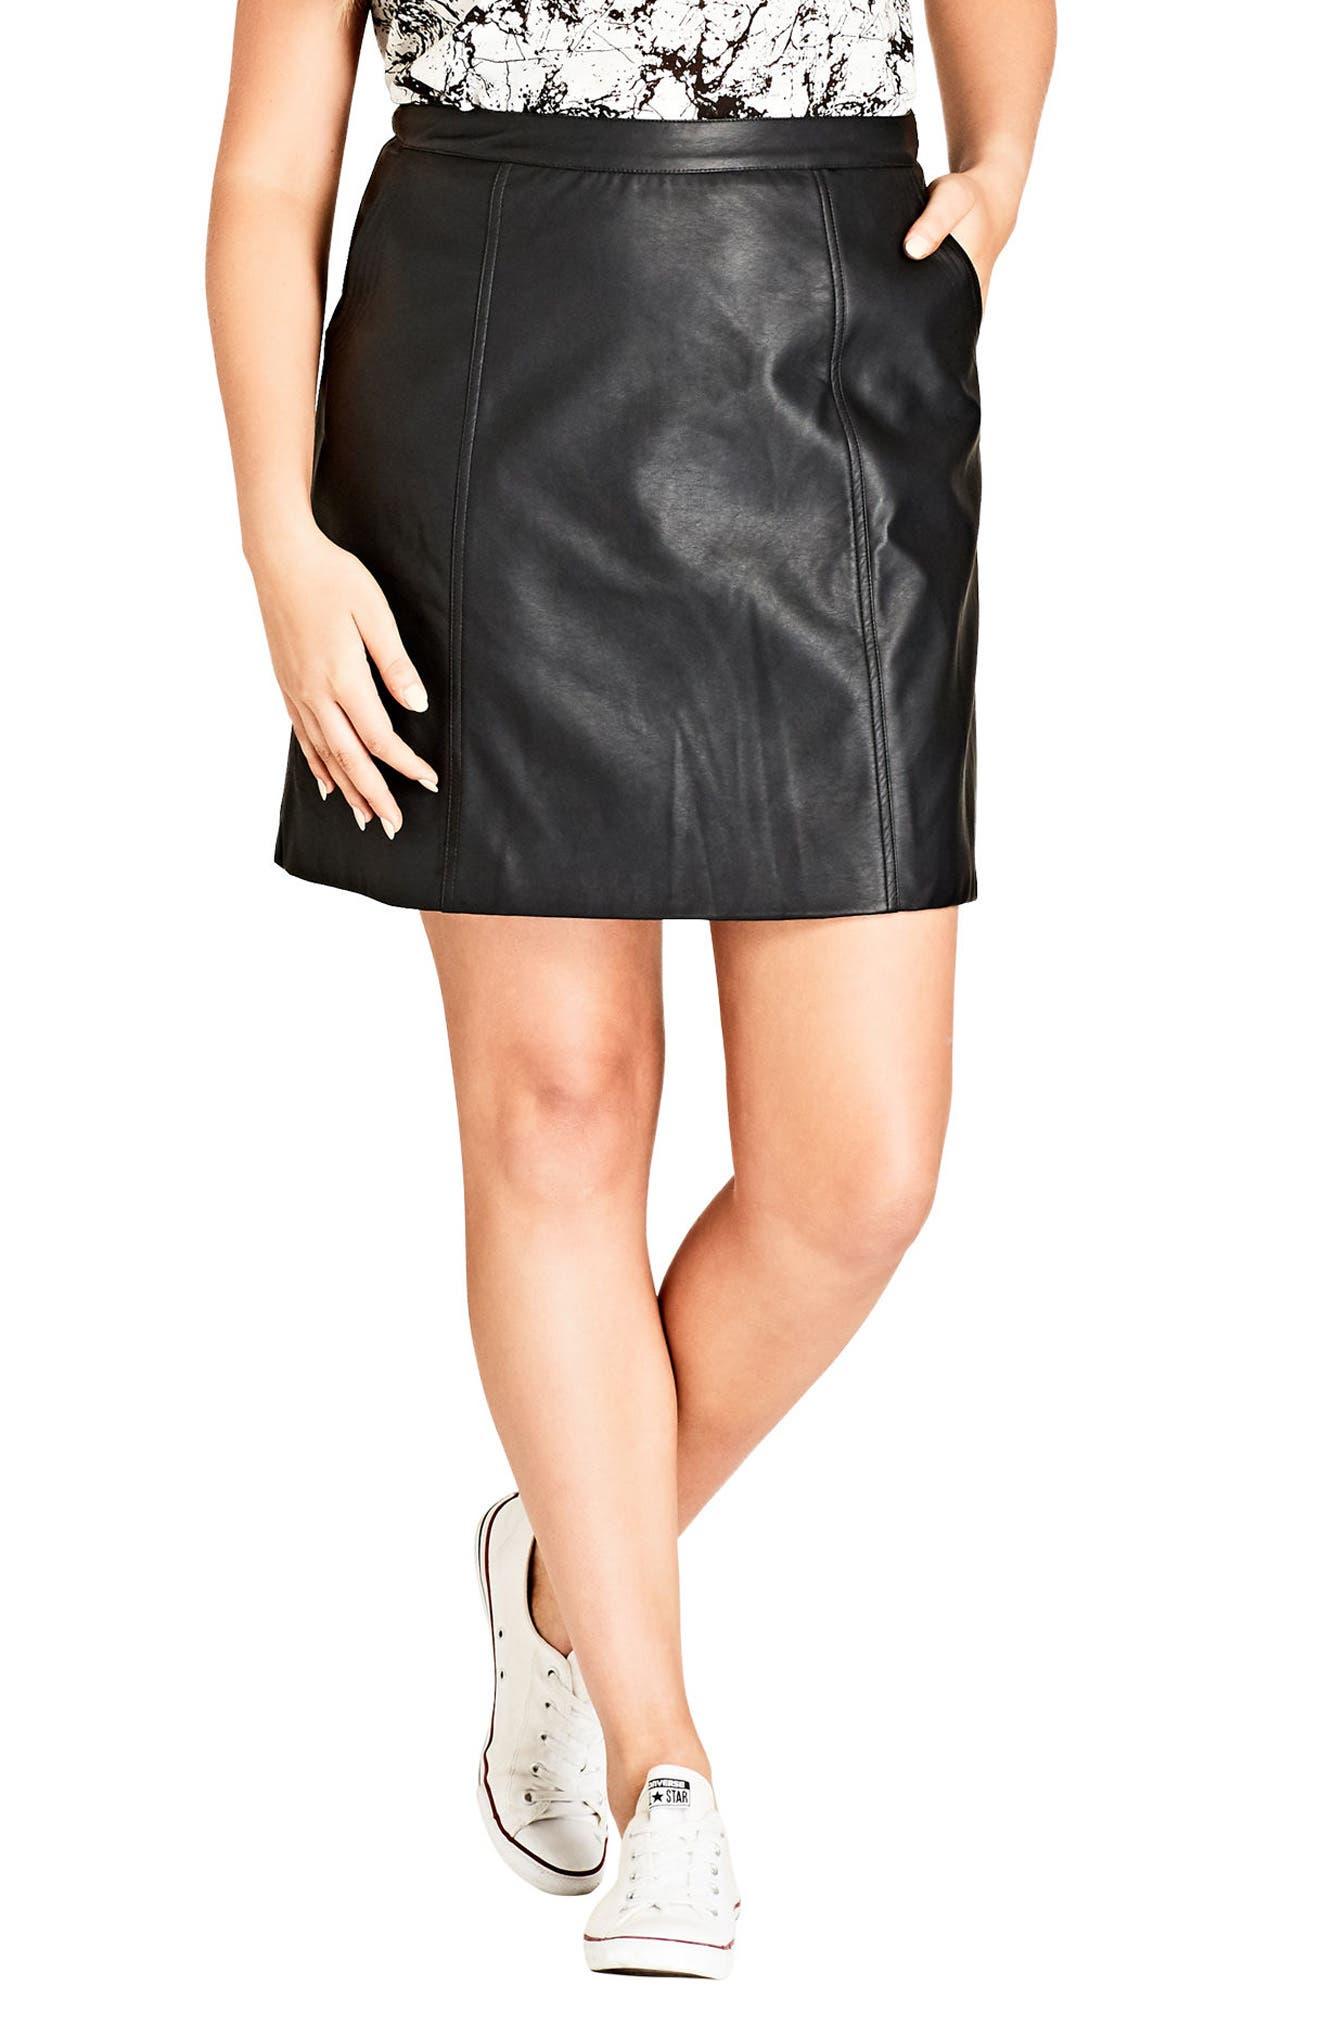 CITY CHIC Faux Leather Miniskirt, Main, color, BLACK